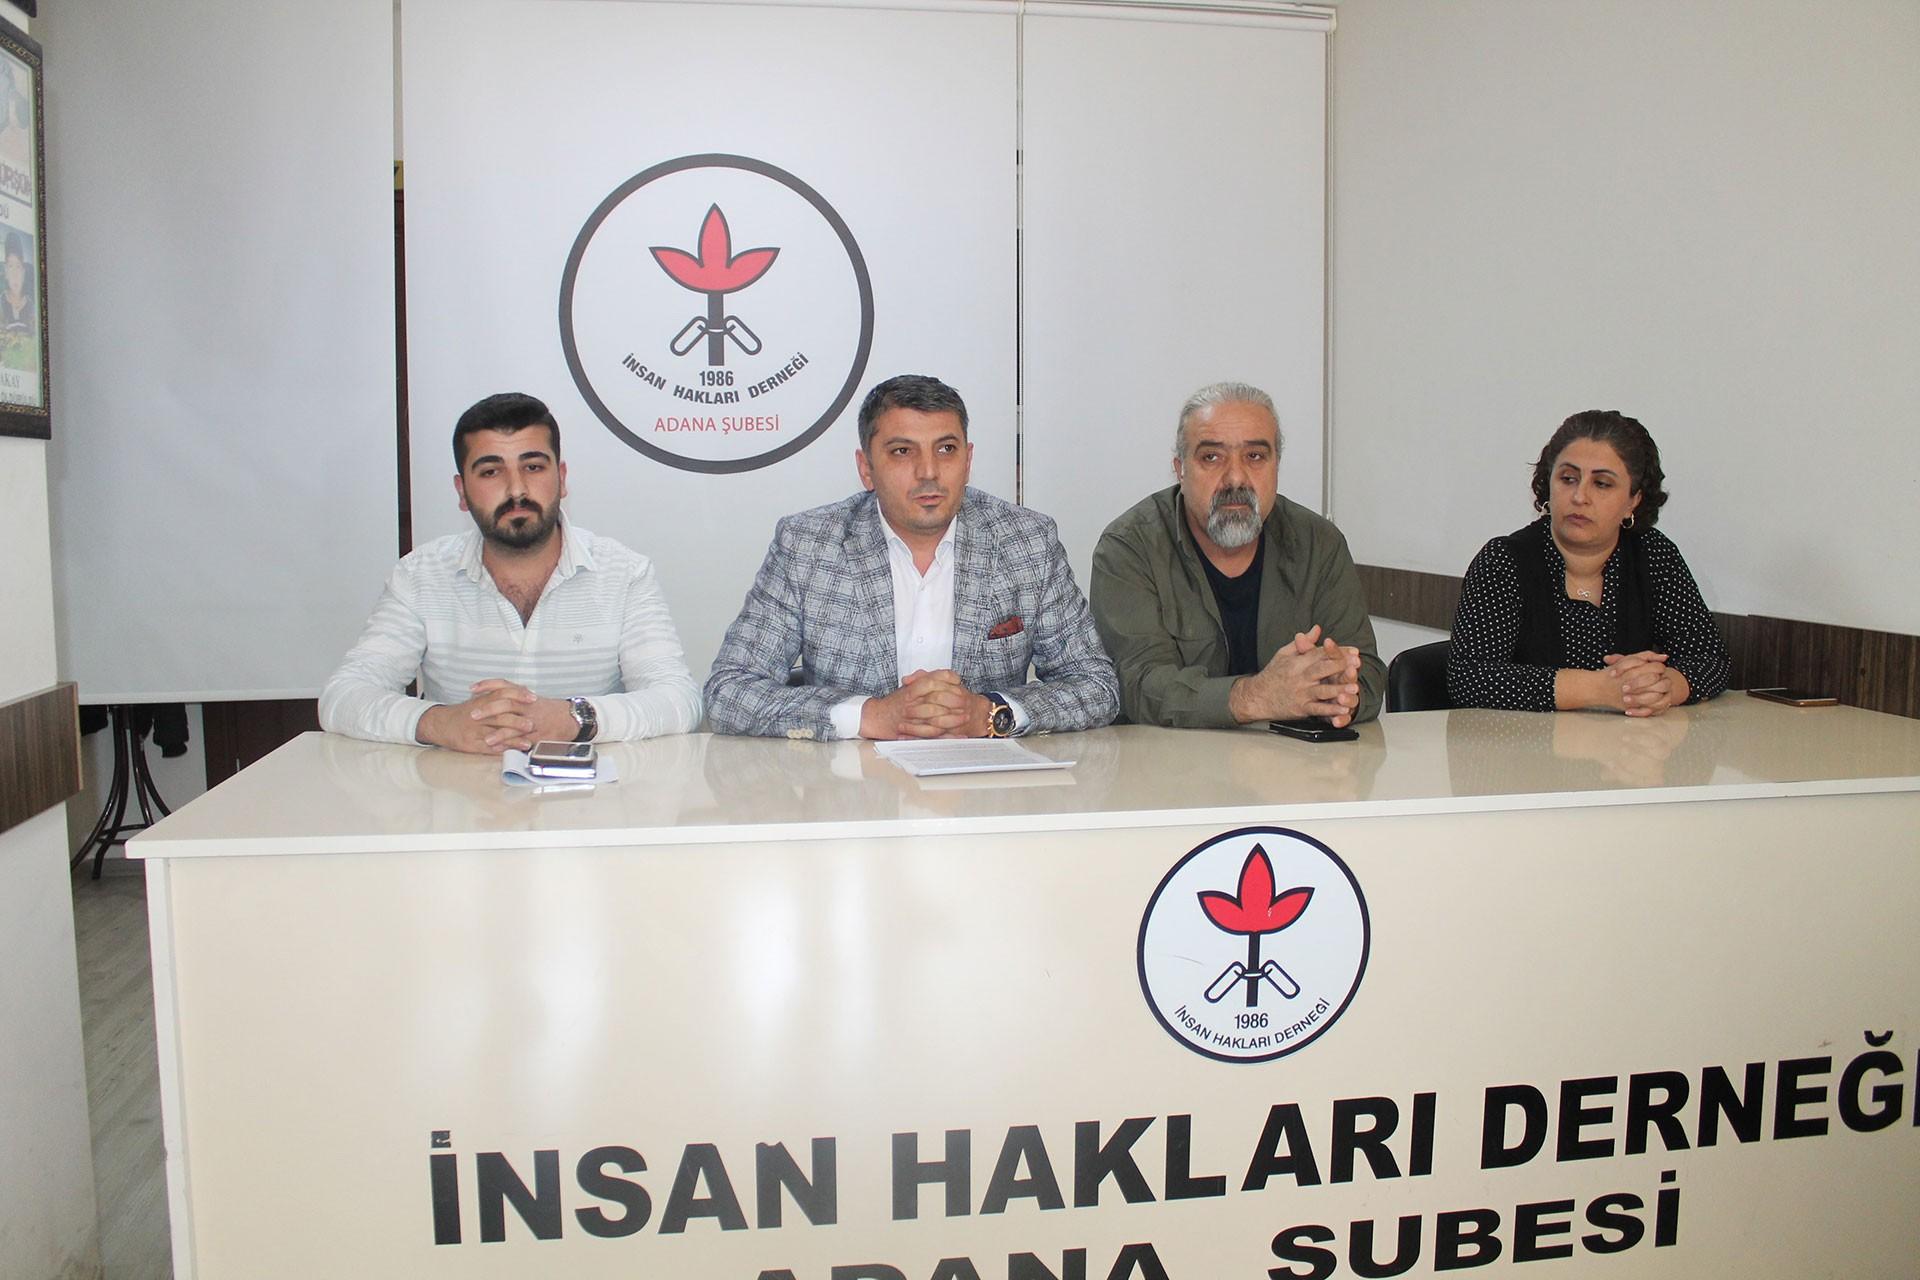 İHD Adana Şubesi